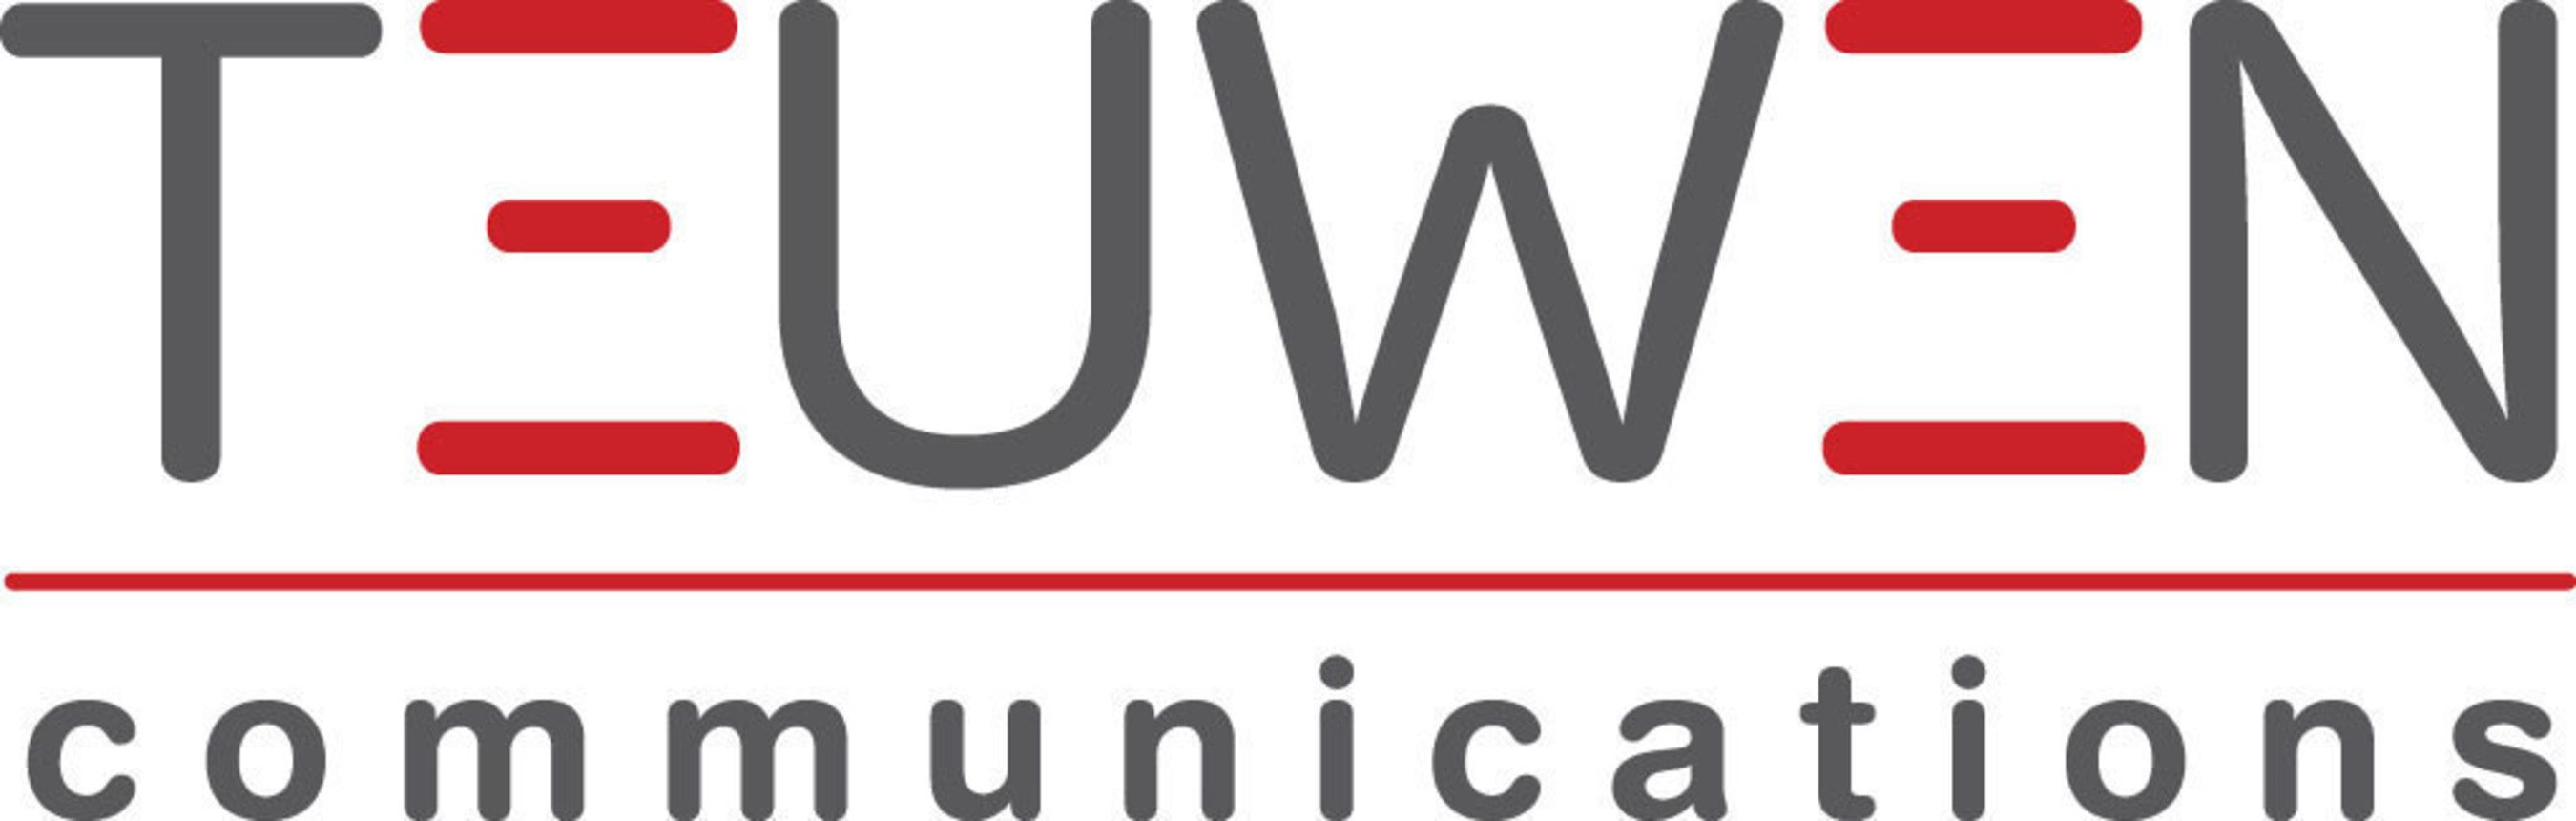 Teuwen Communications celebrates its 20th anniversary. (PRNewsFoto/Teuwen Communications)